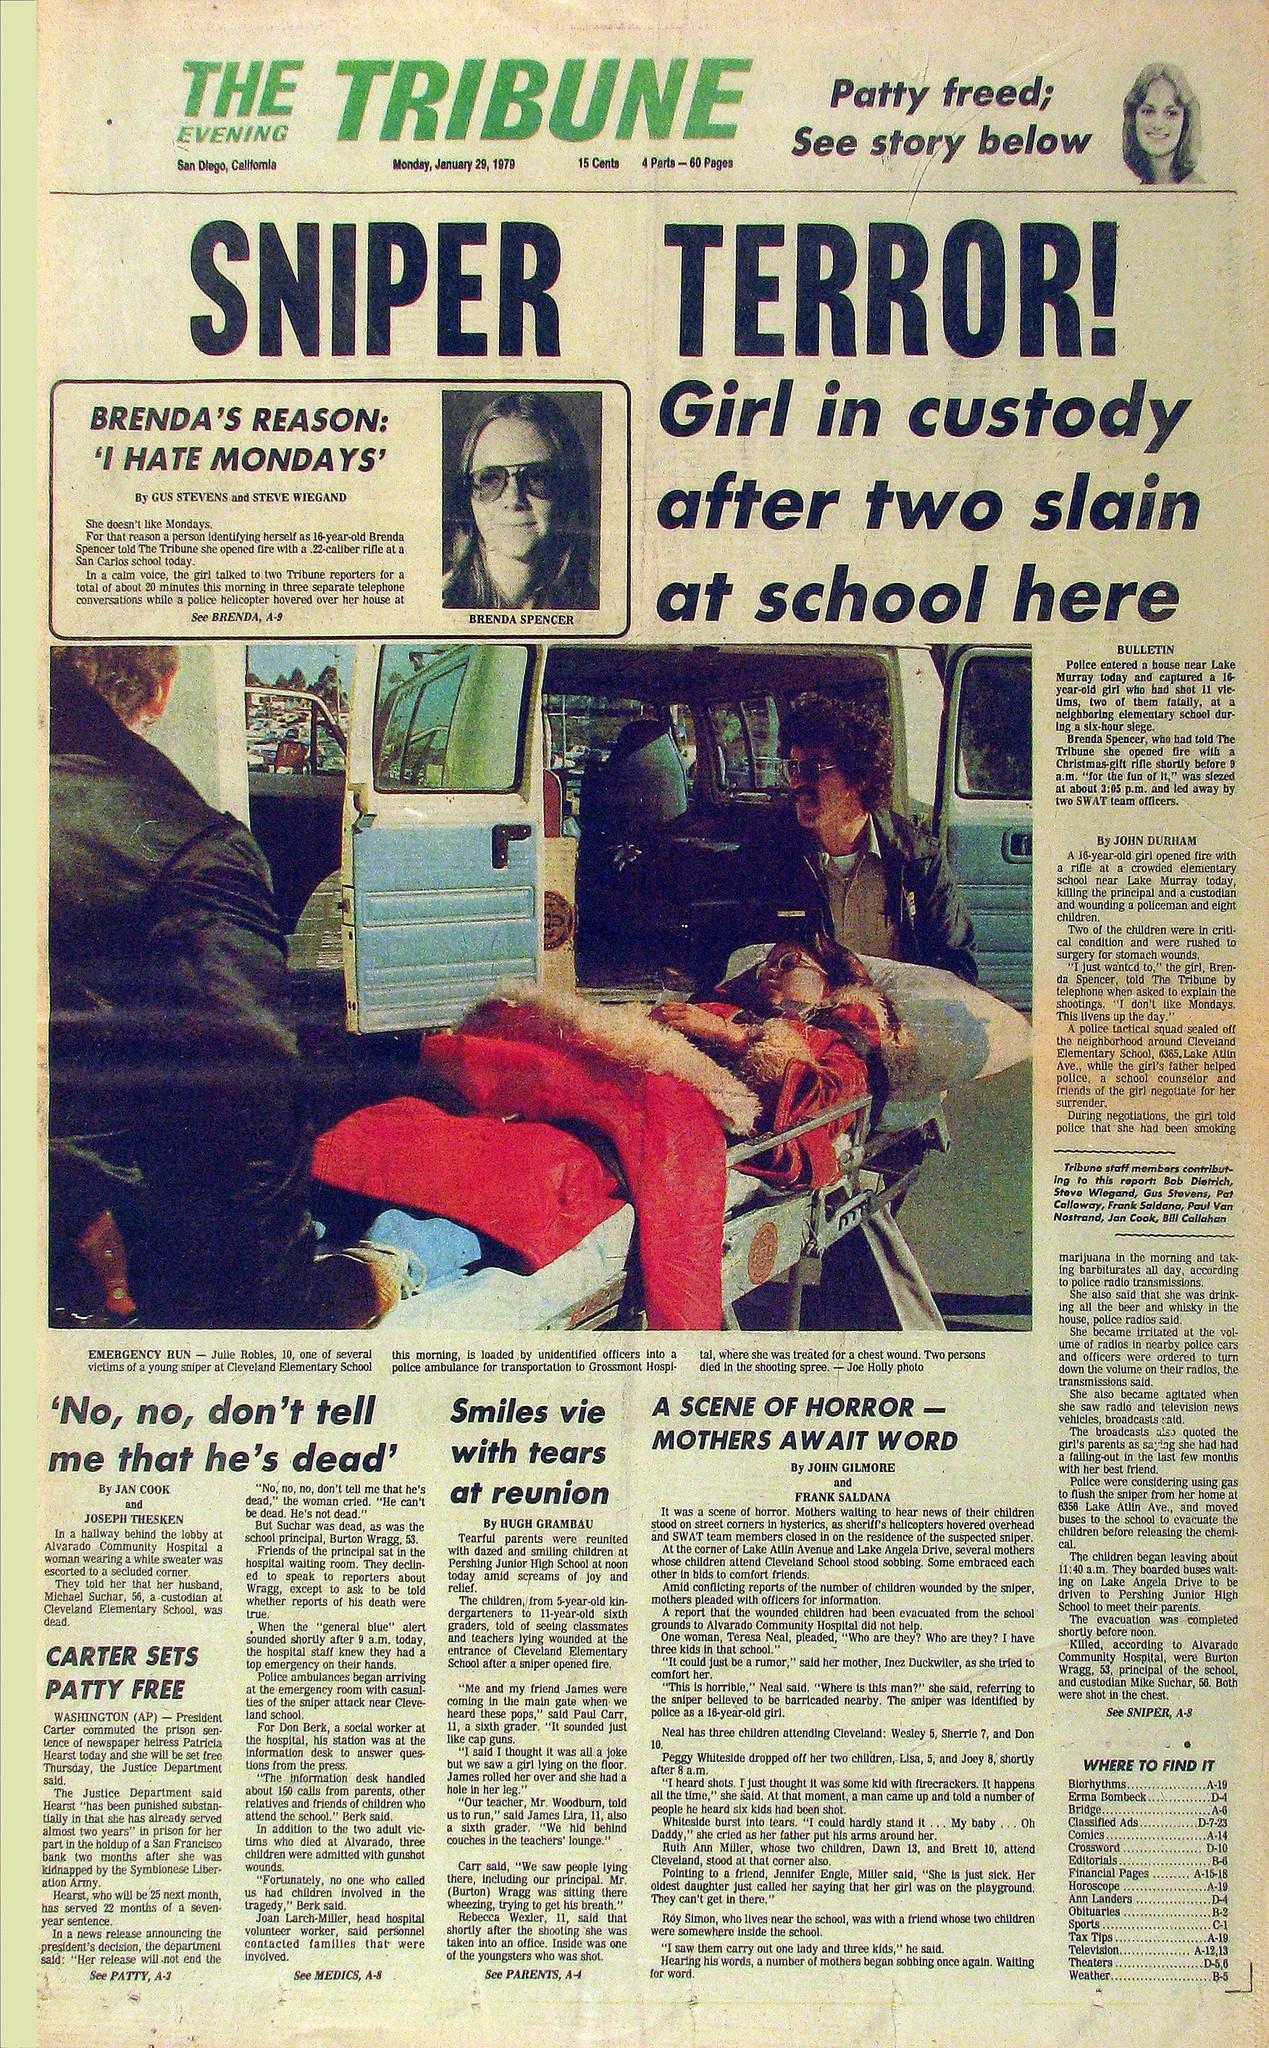 January 29, 1979